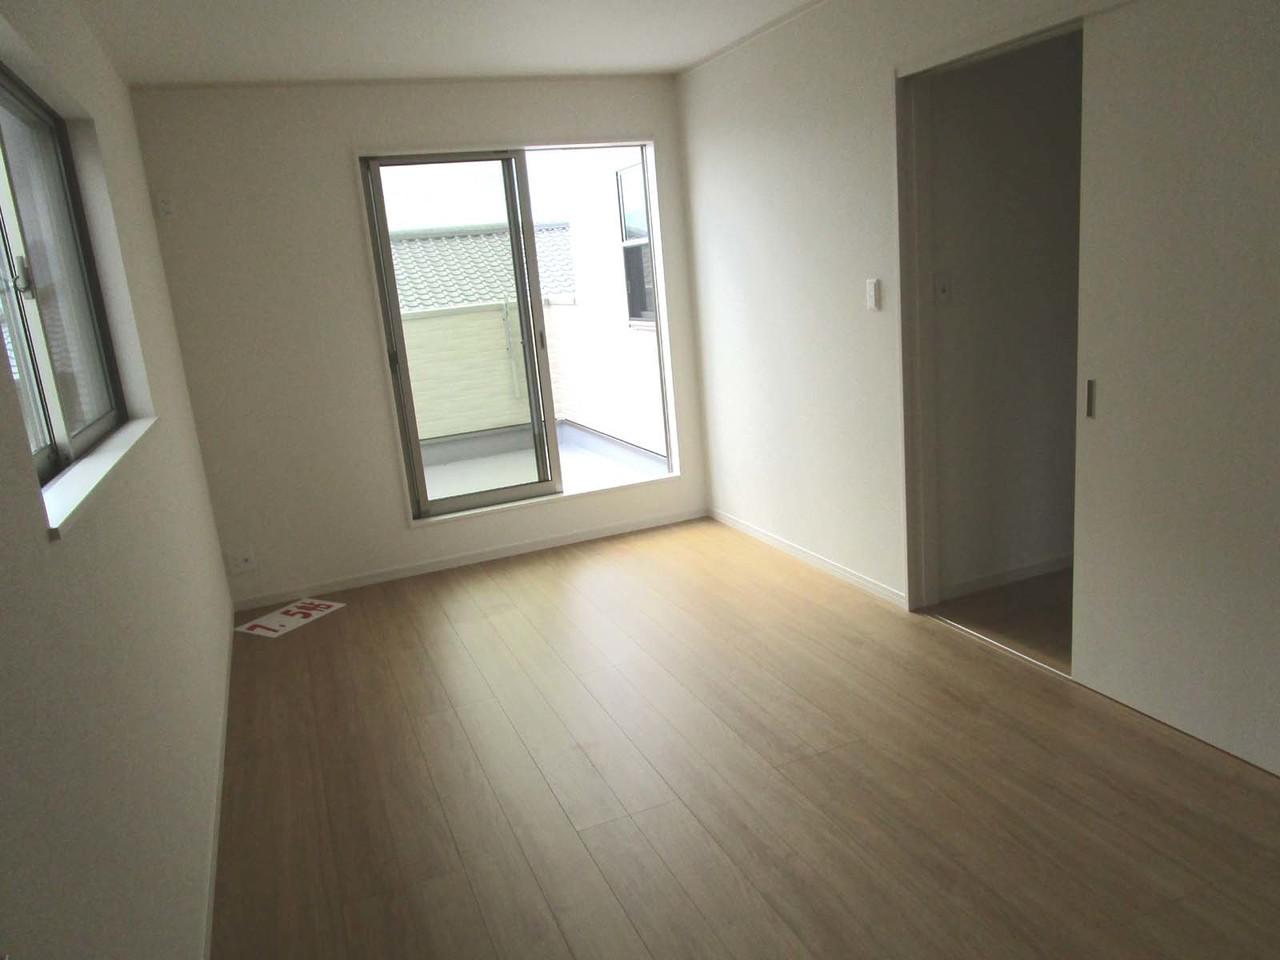 2Fには6帖、6.5帖、7.5帖の洋室3室があり、どの部屋にもクローゼットあり。